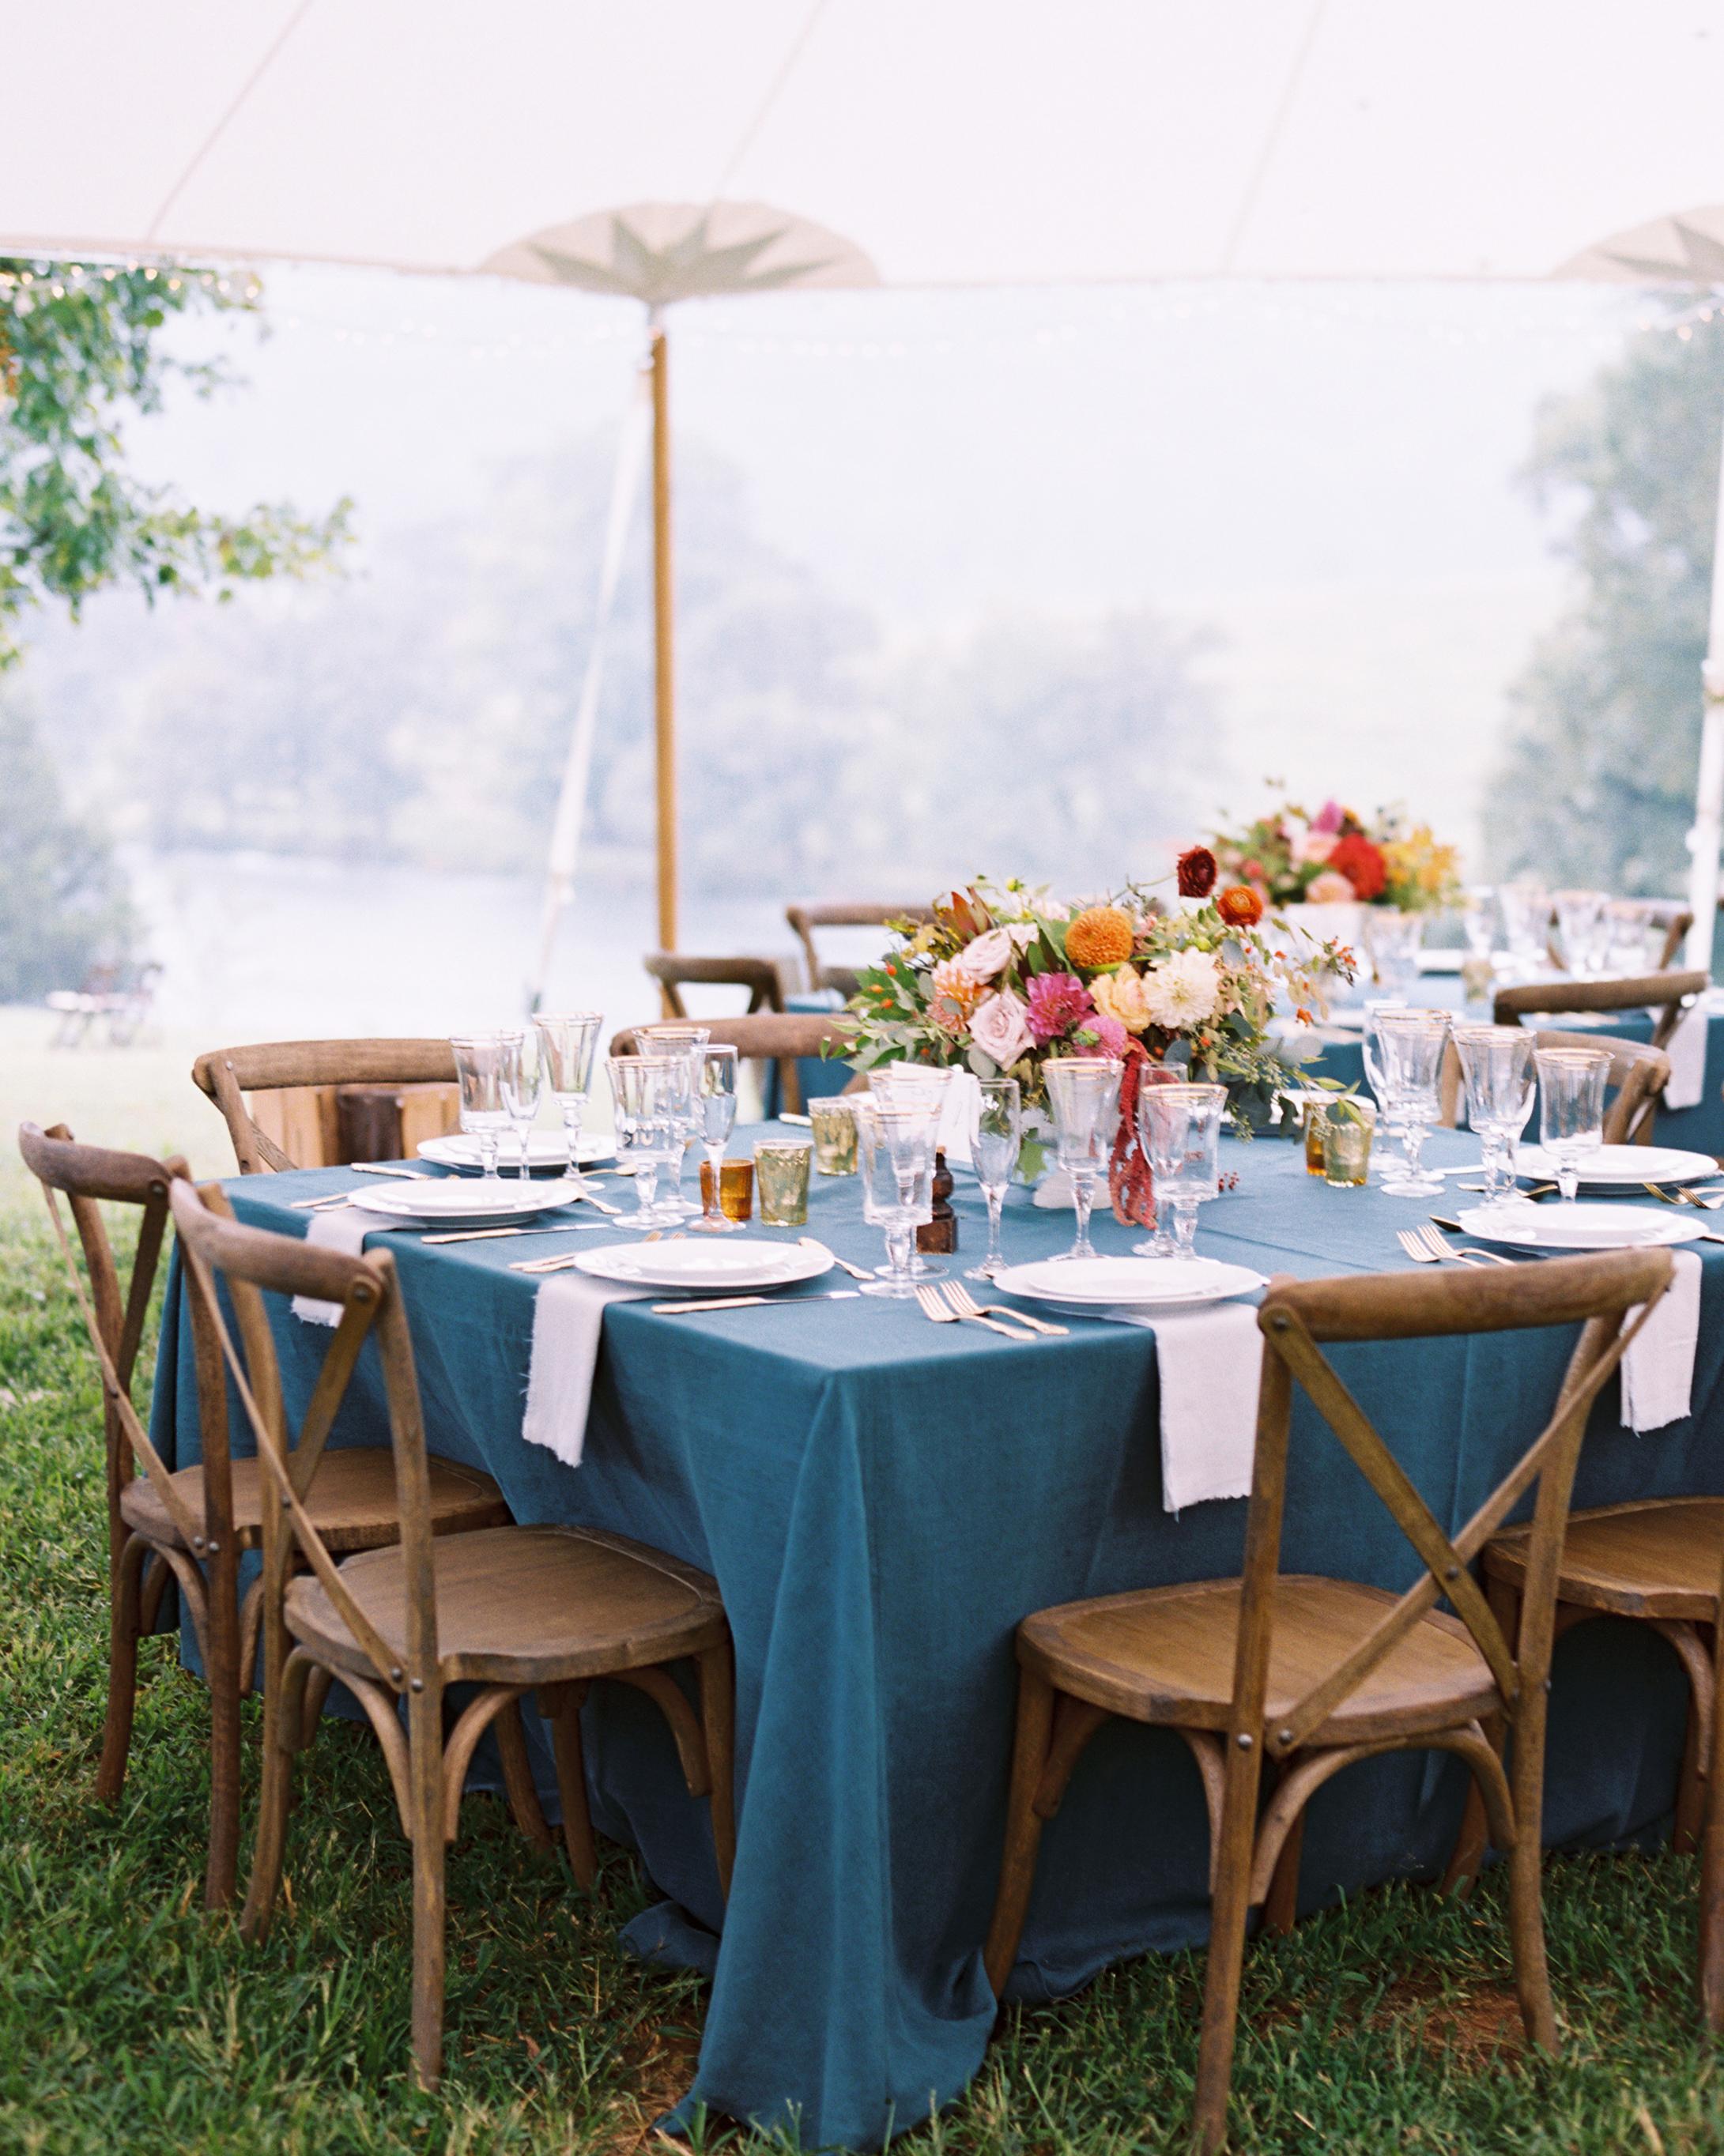 michelle-john-wedding-north-carolina-17-s111840-0215.jpg